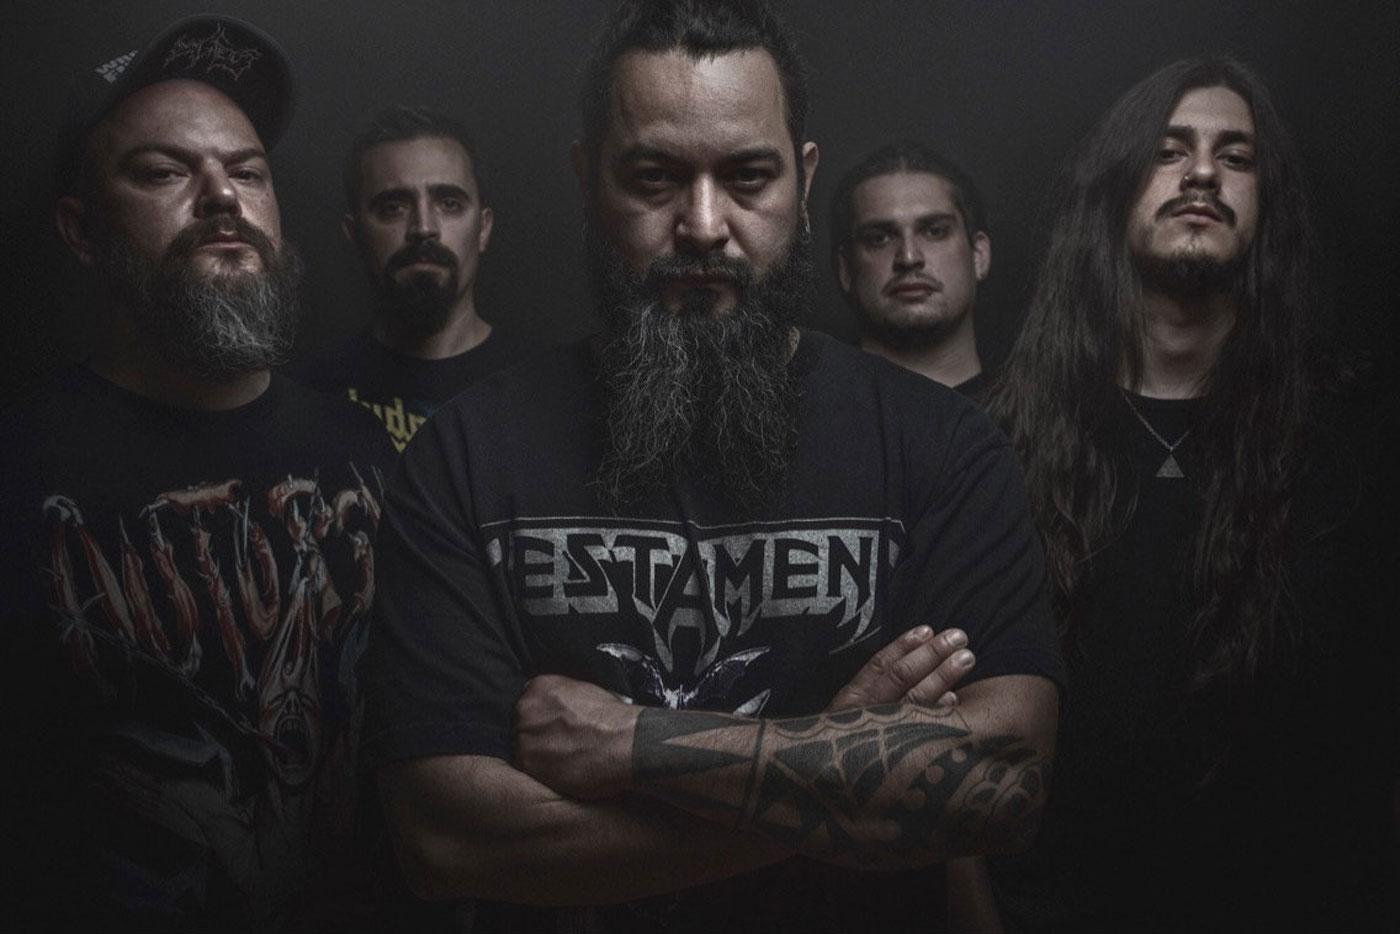 Nace el Hermanos de Sangre Metalfest